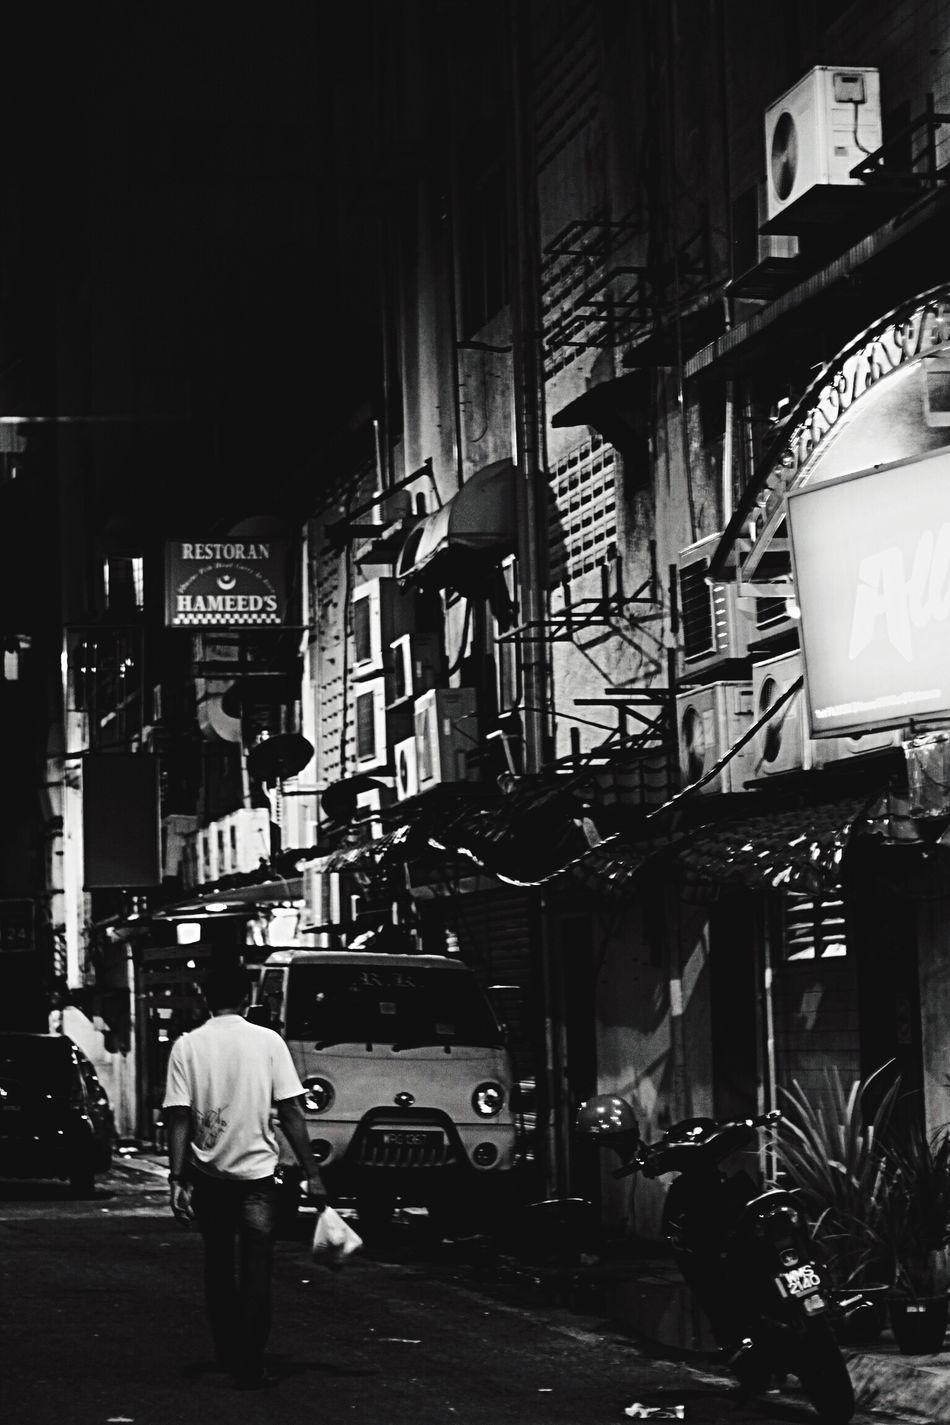 Kuala Lumpur Street City Life Night Illuminated Men City Architecture AirConditioners EOS500d EyeEmNewHere Canon Concrete 2015  The Secret Spaces